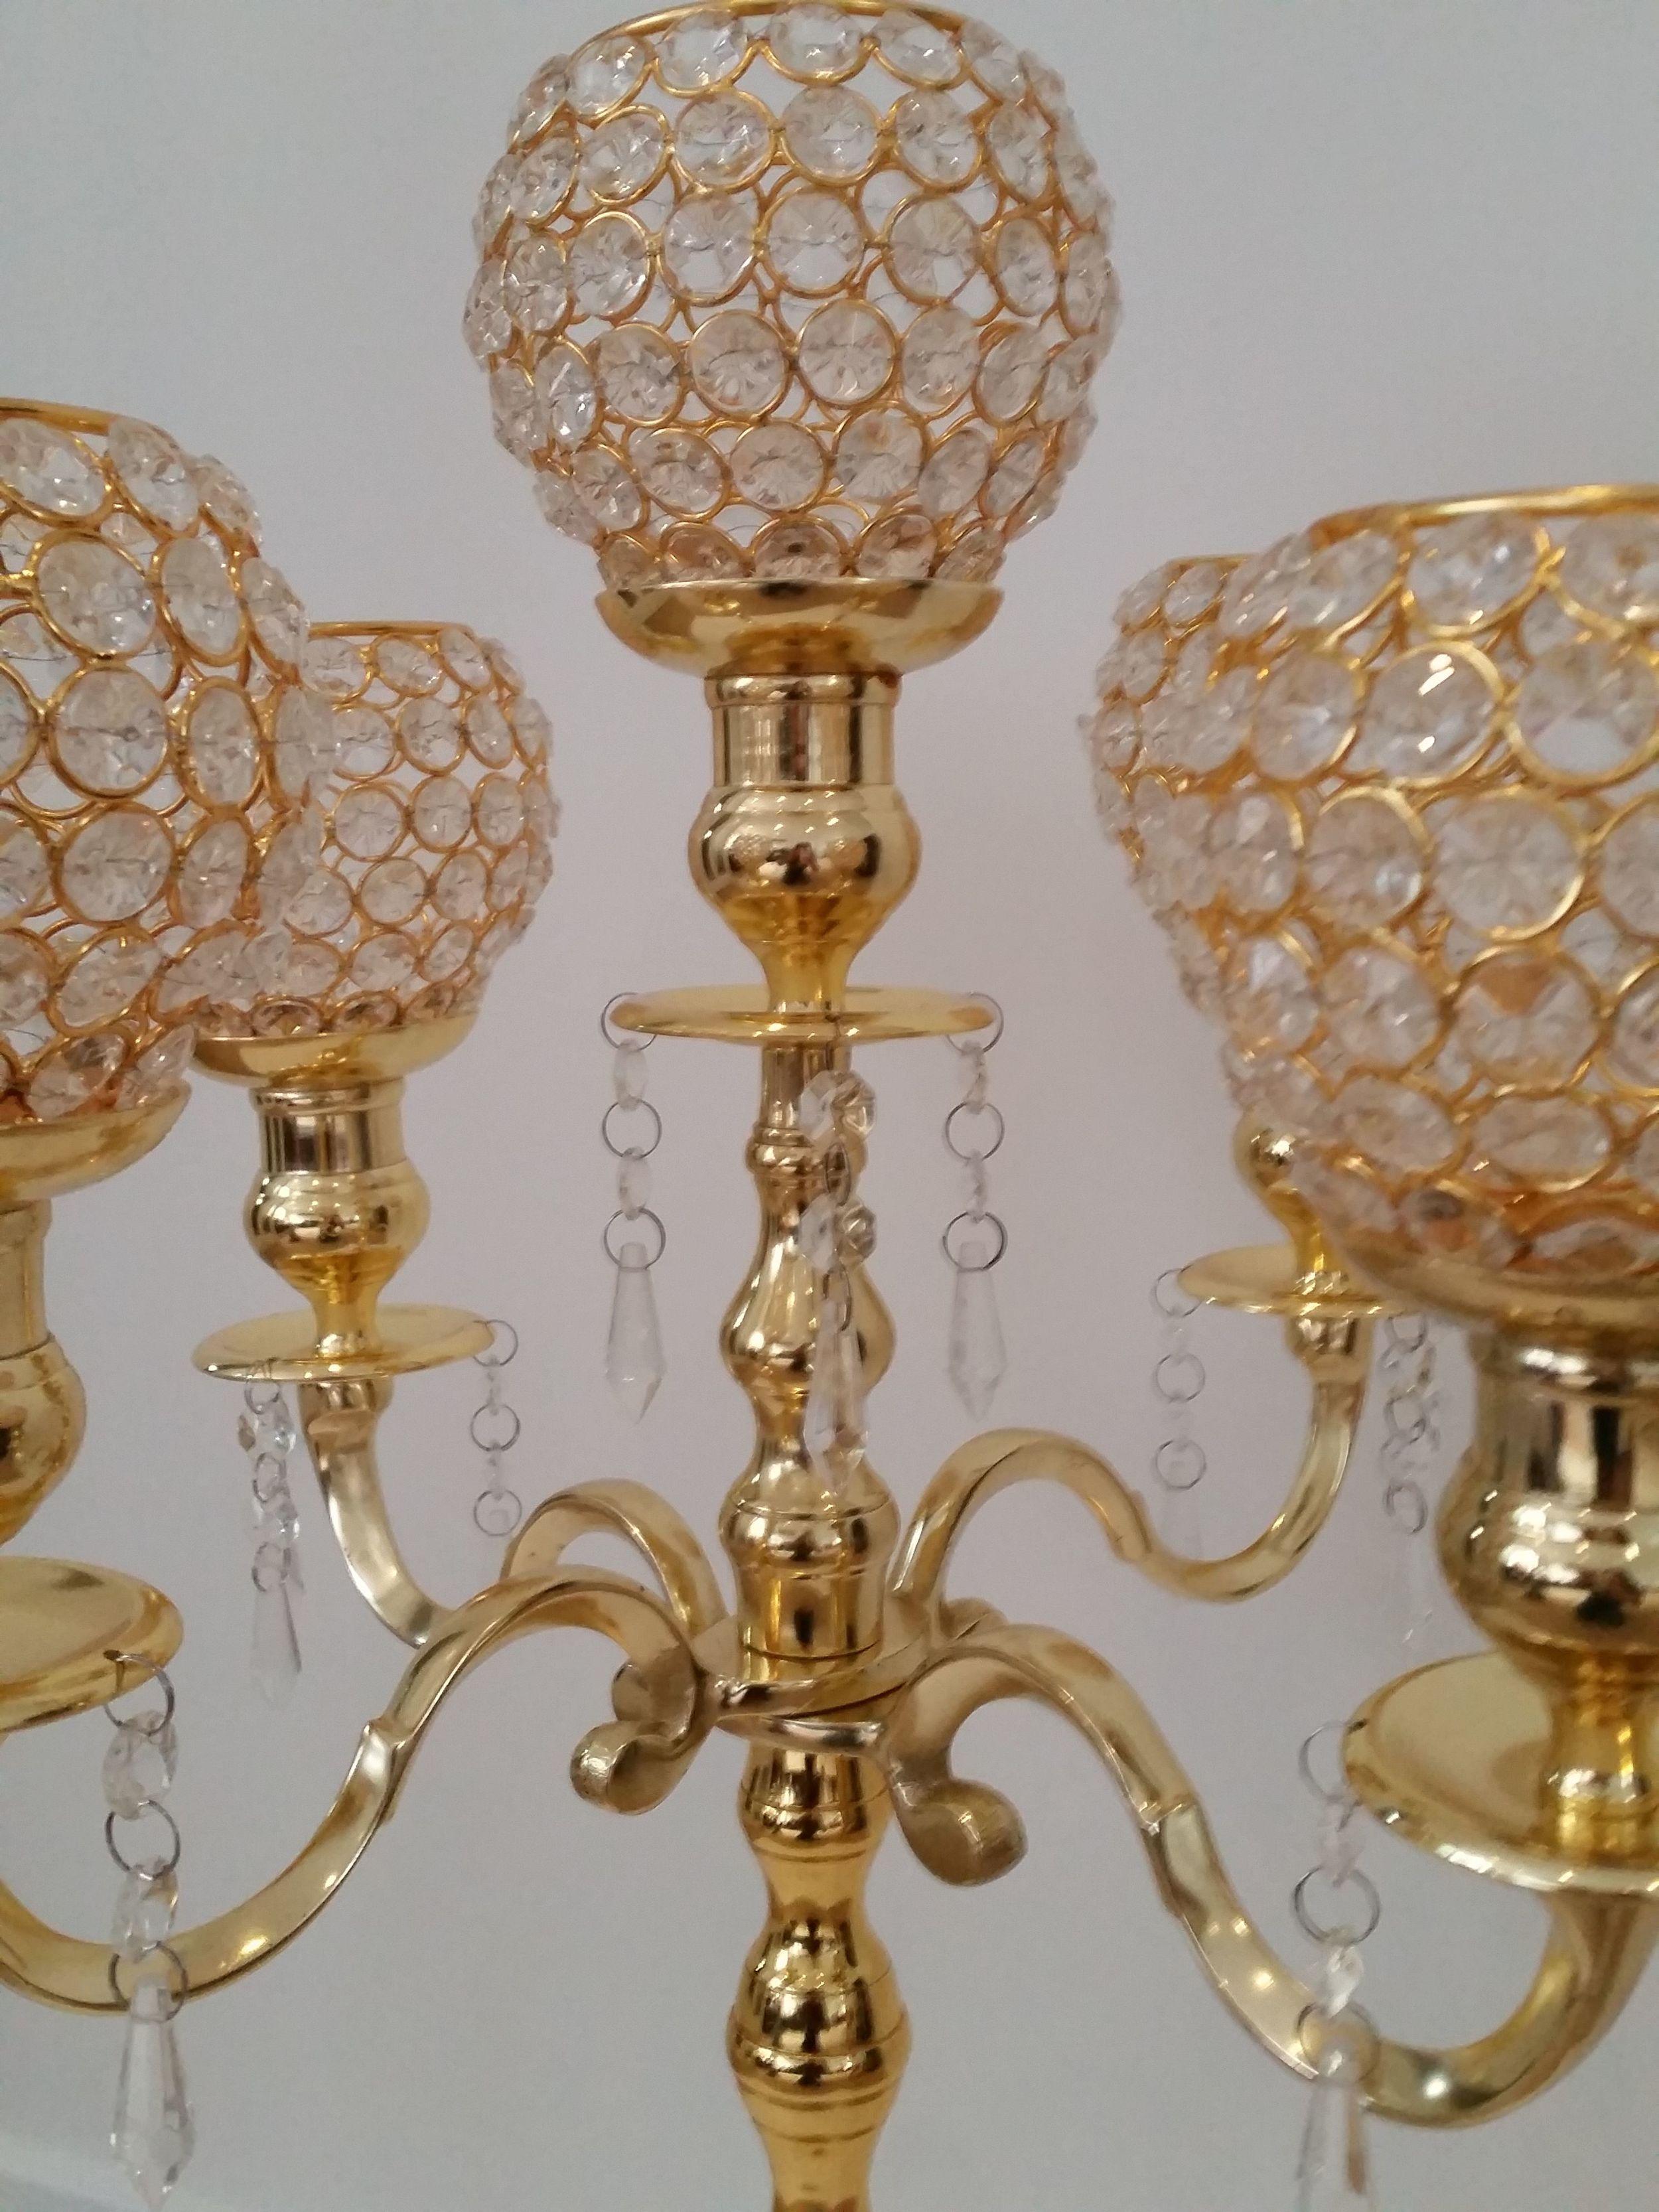 Gold 75cm Crystal Globe Candelabras with crystals5.jpg